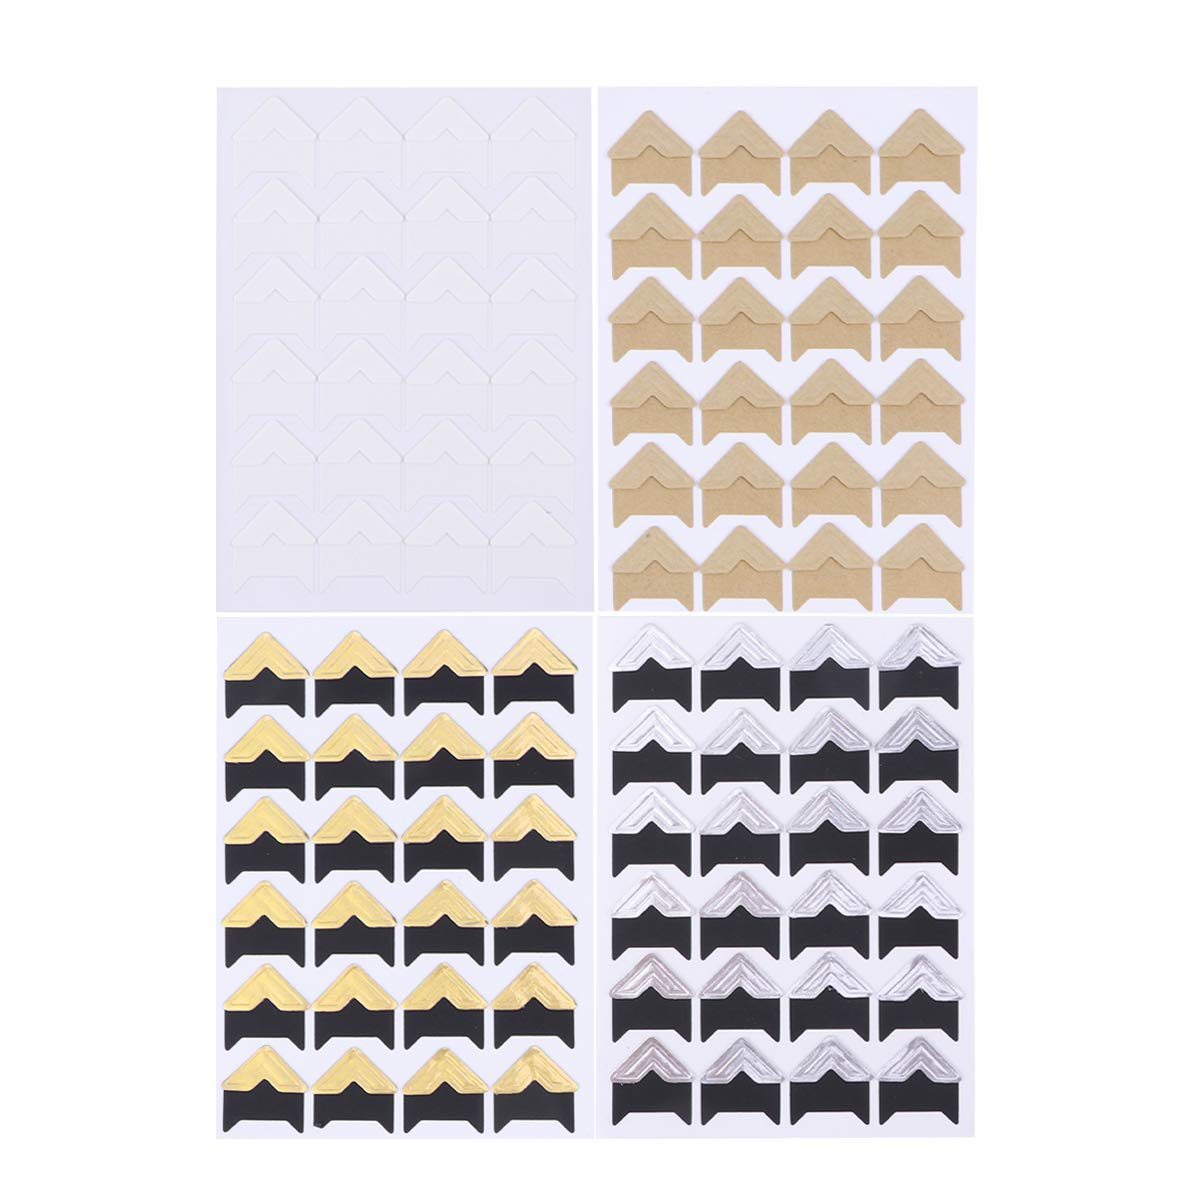 Toyvian 20 Sheets of Self Adhesive Photo Corners for scrapbooks Memory Books